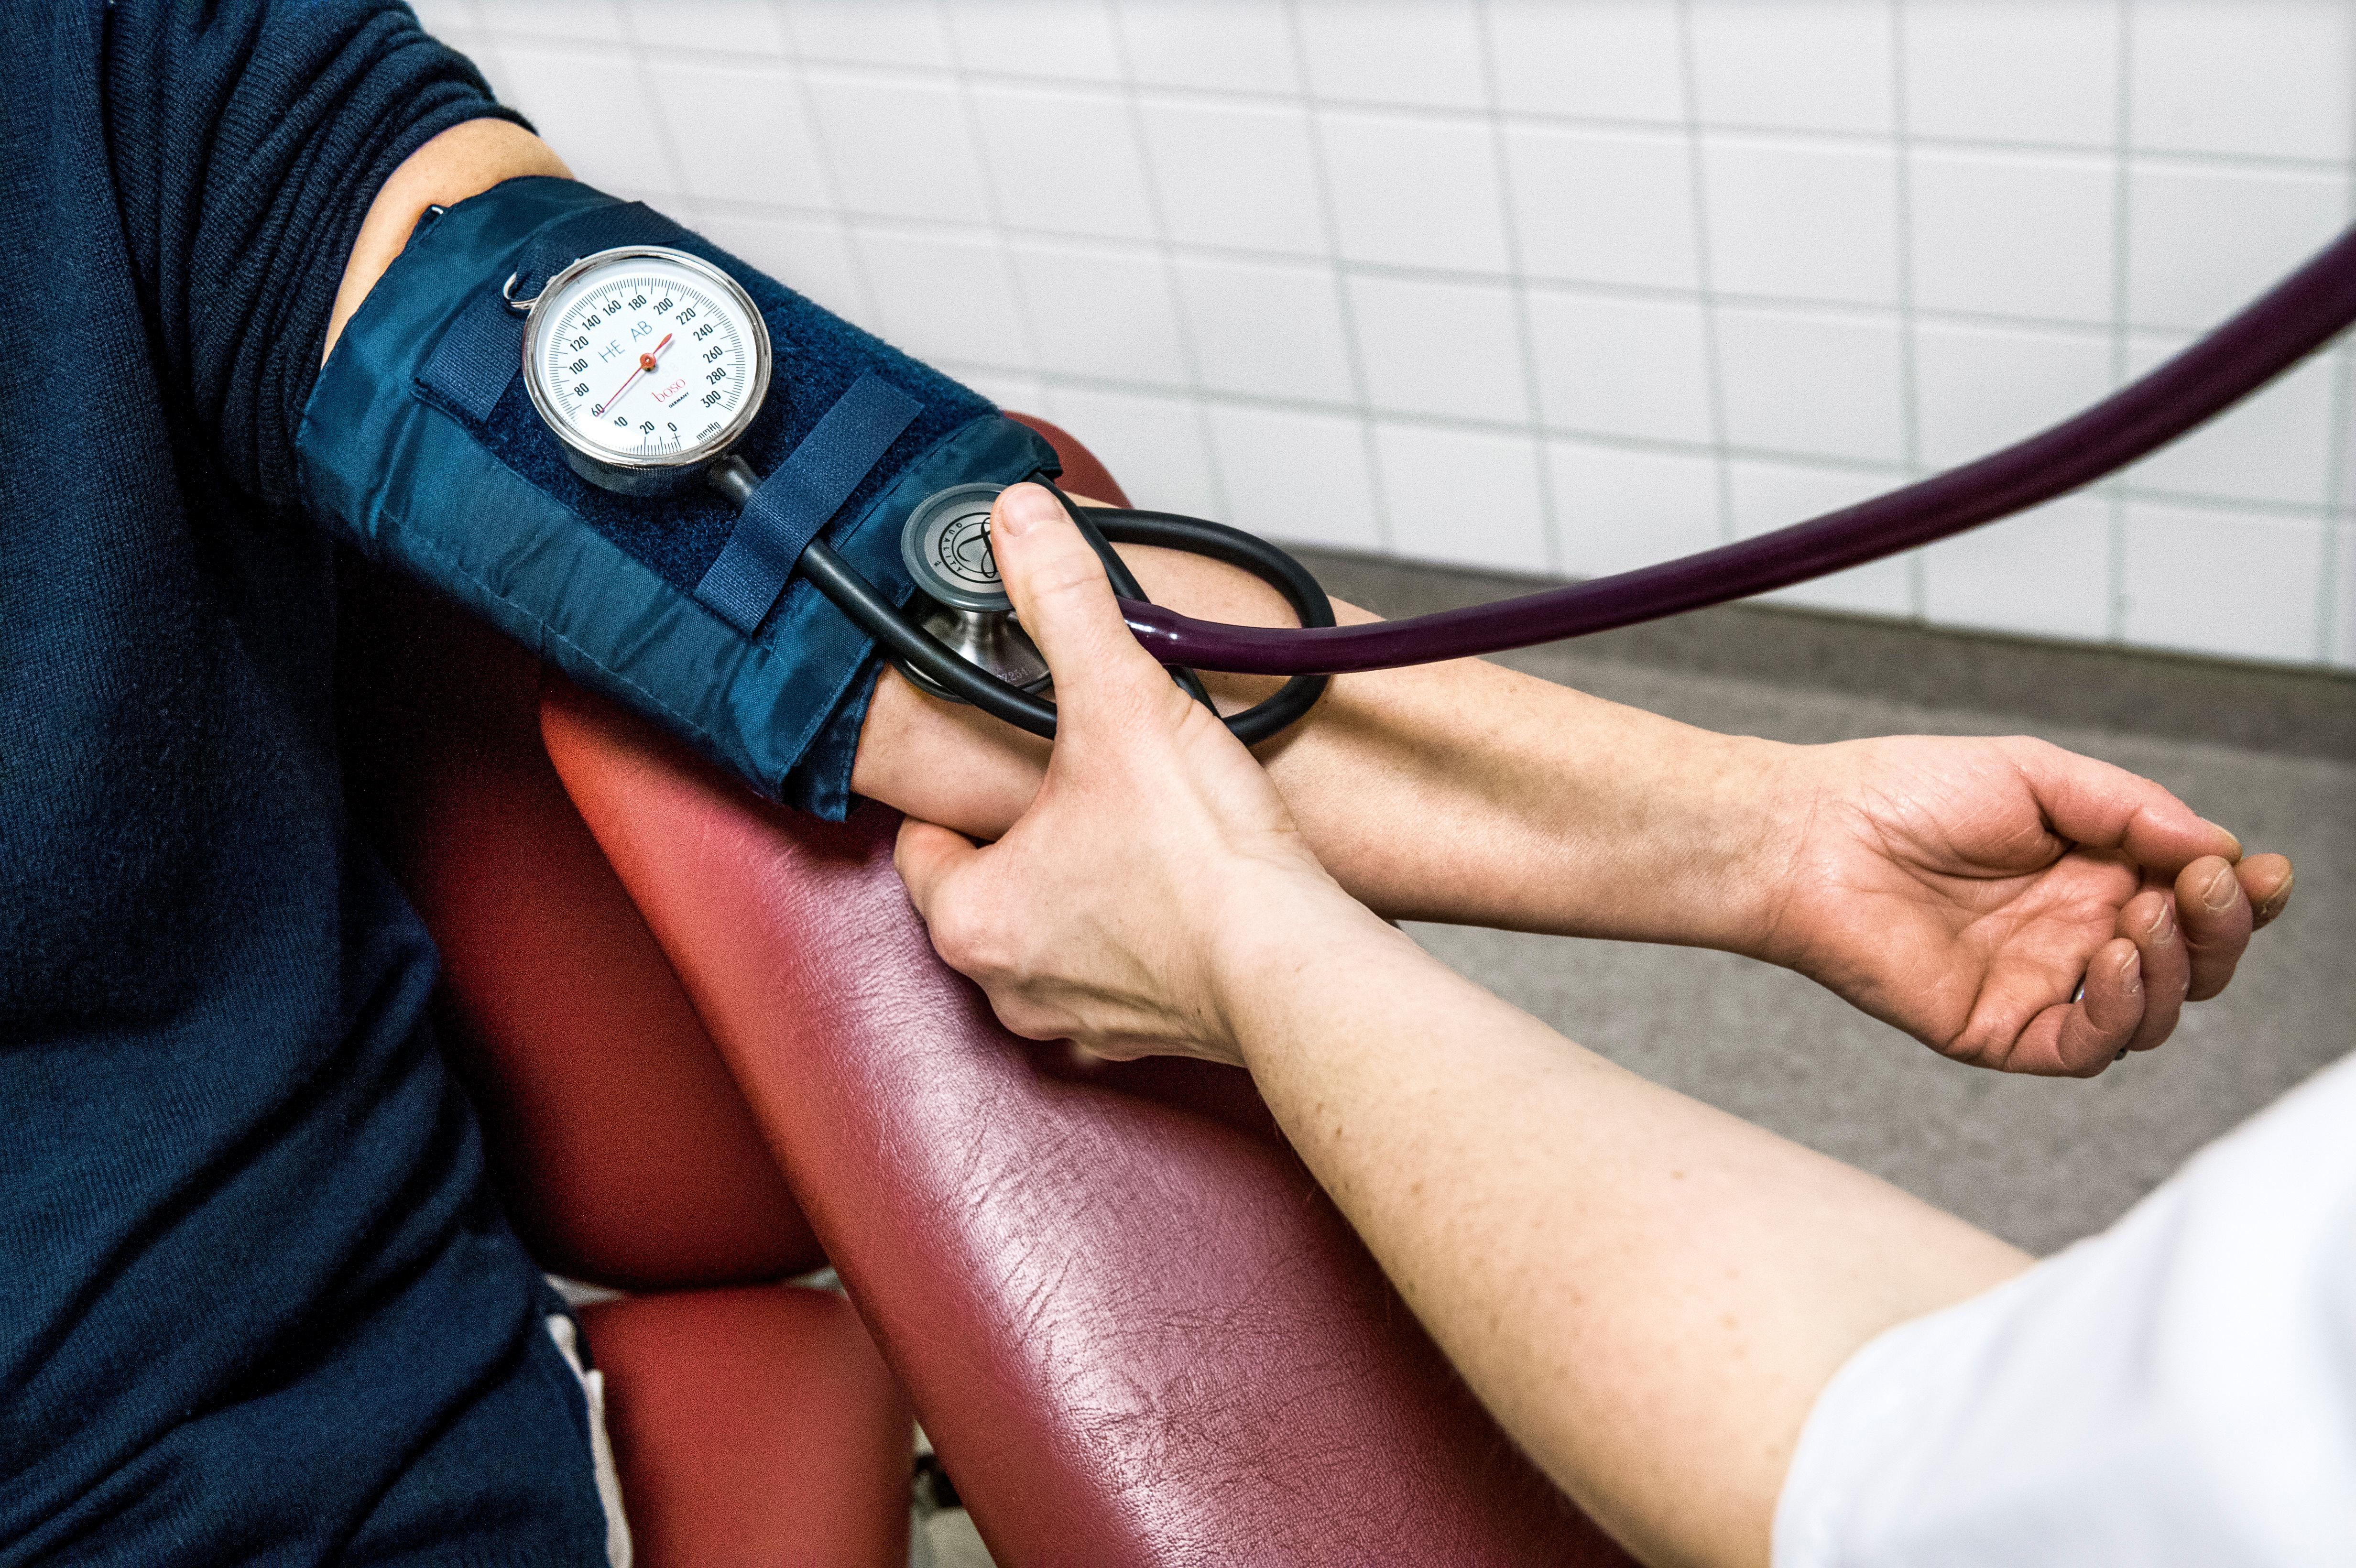 akut högt blodtryck